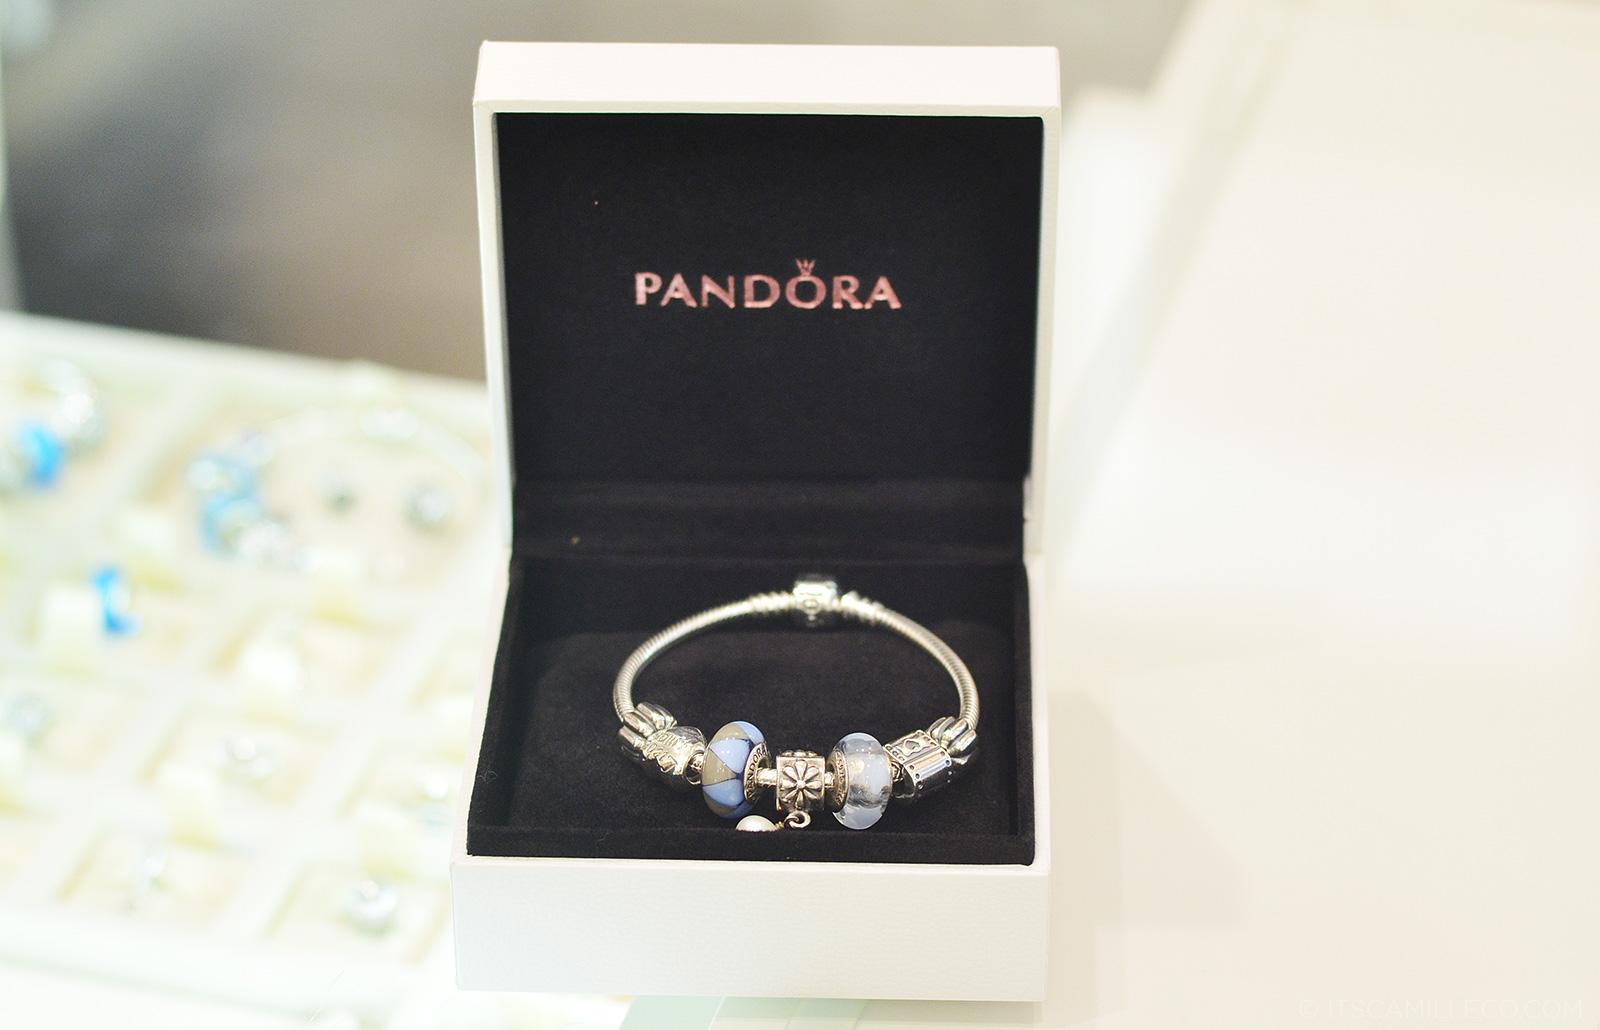 pandora bracelet charms price philippines